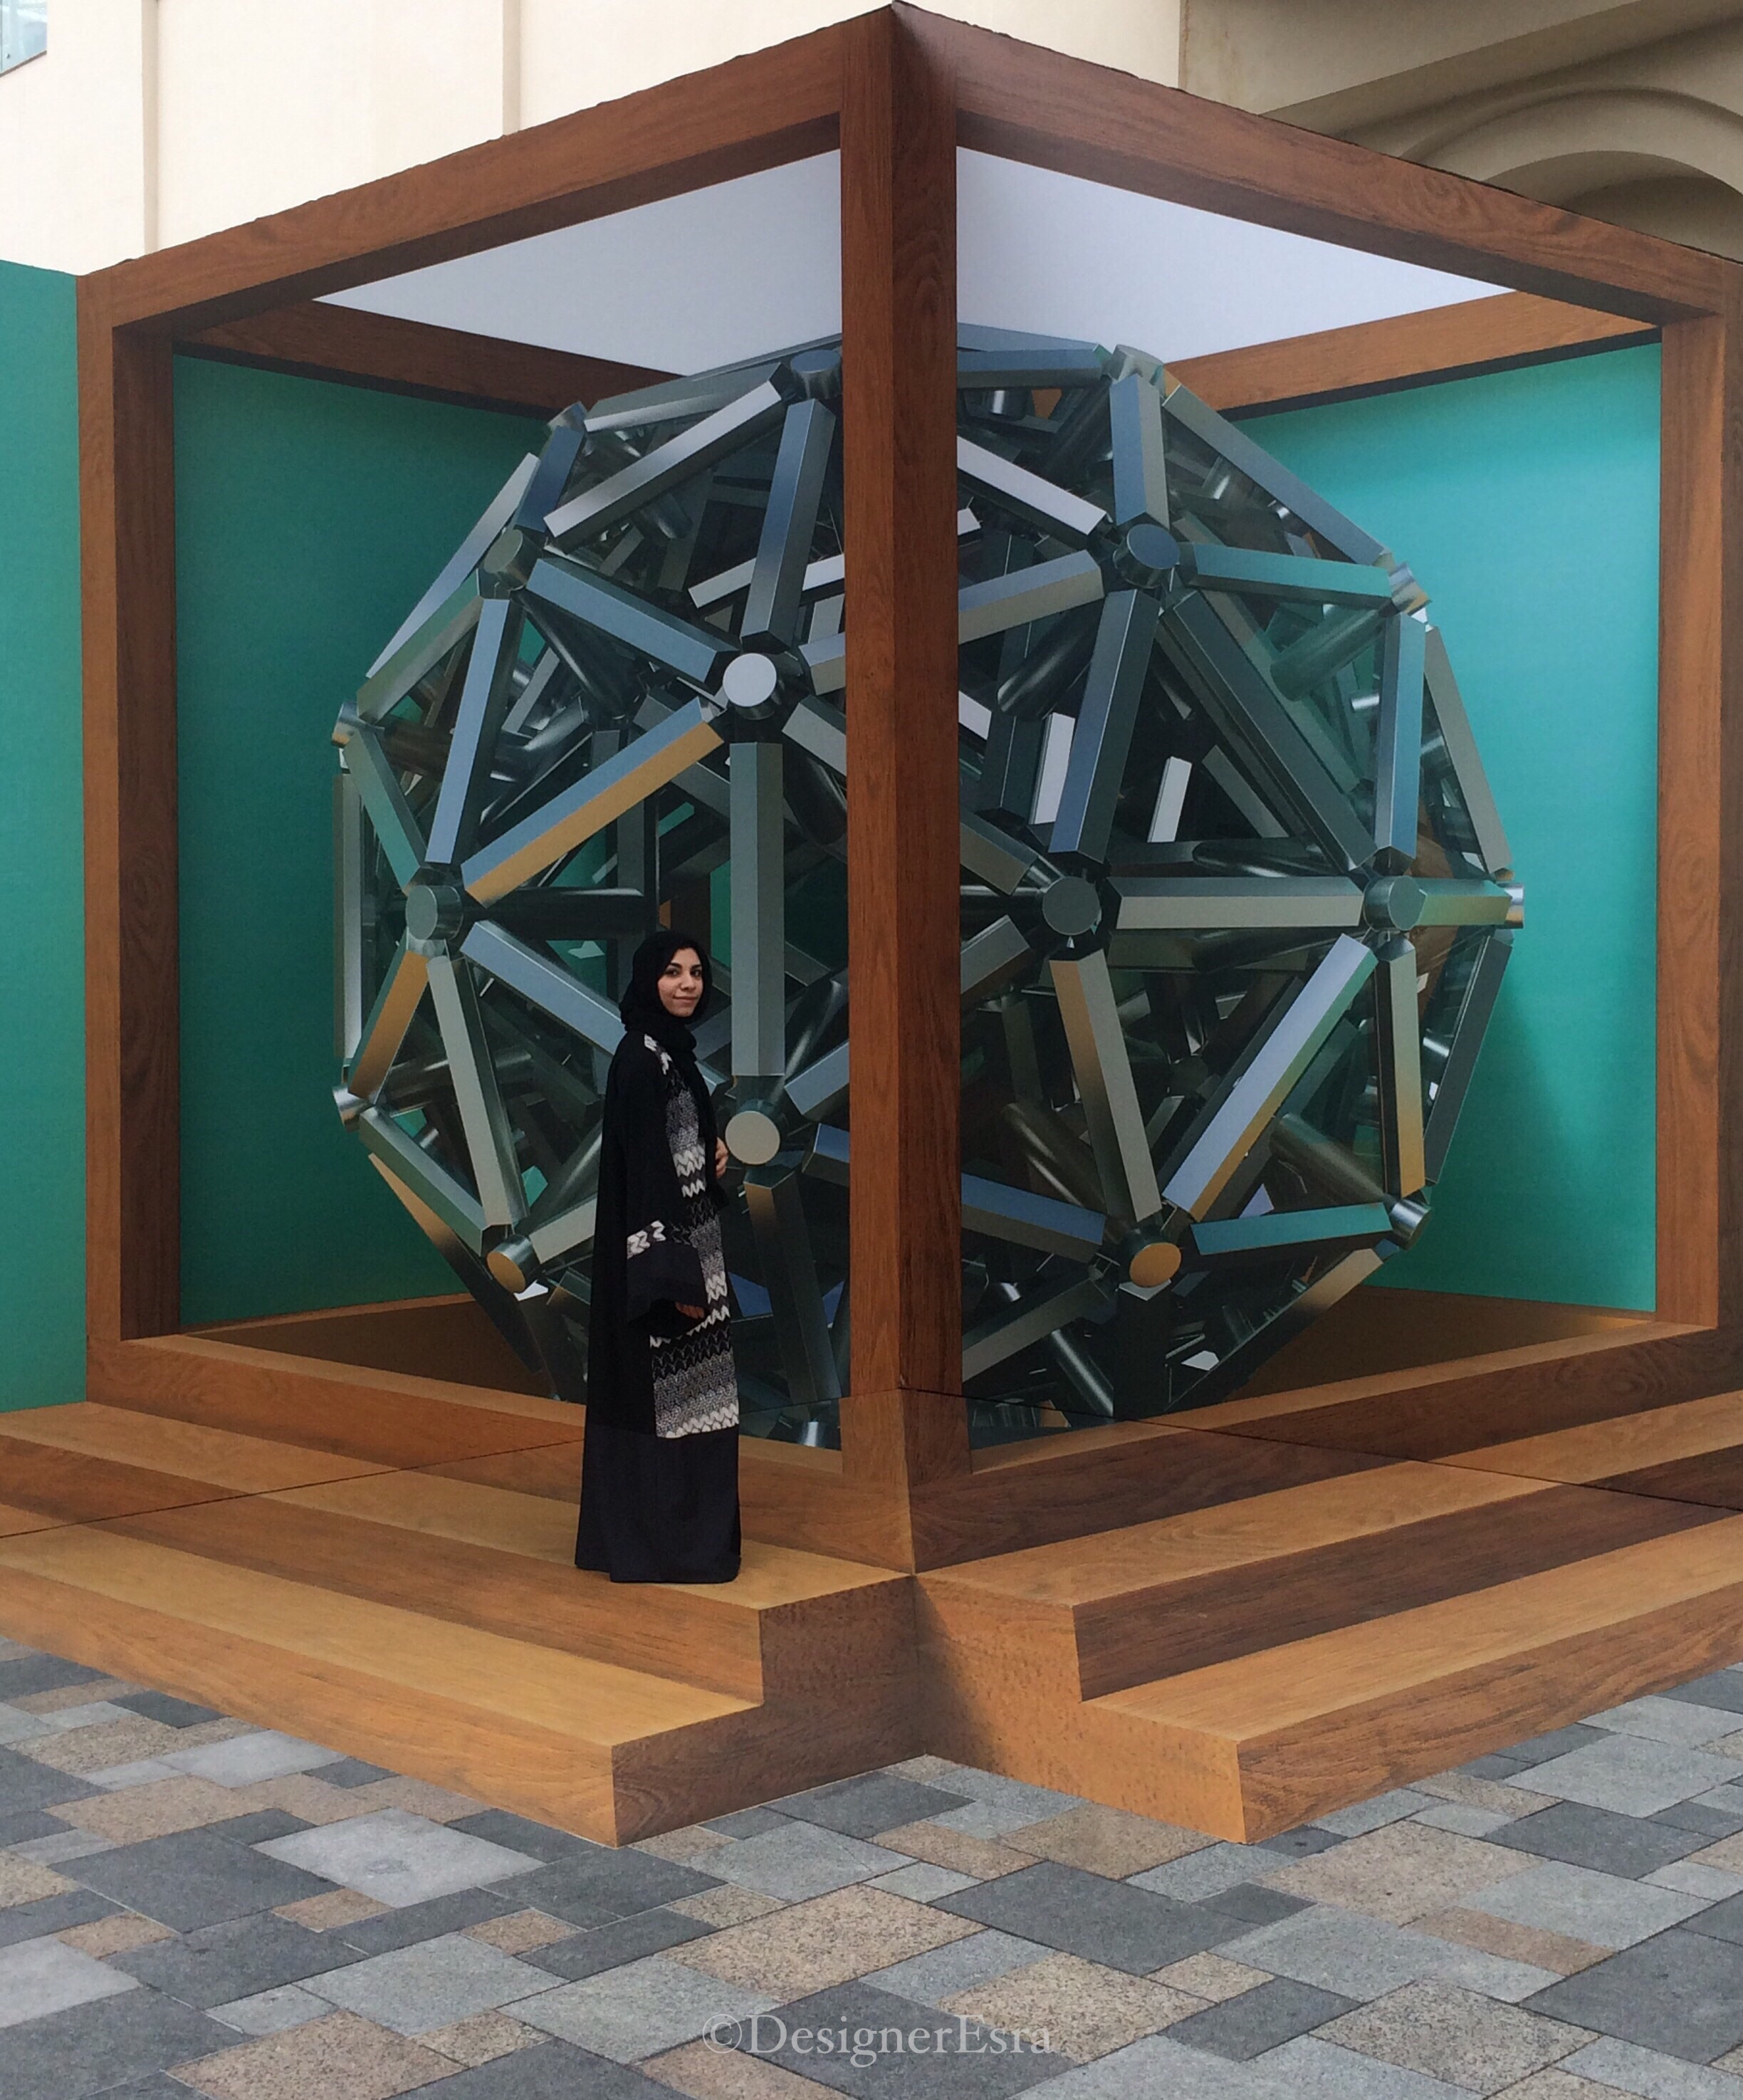 3D Cube Street Painting in Dubai